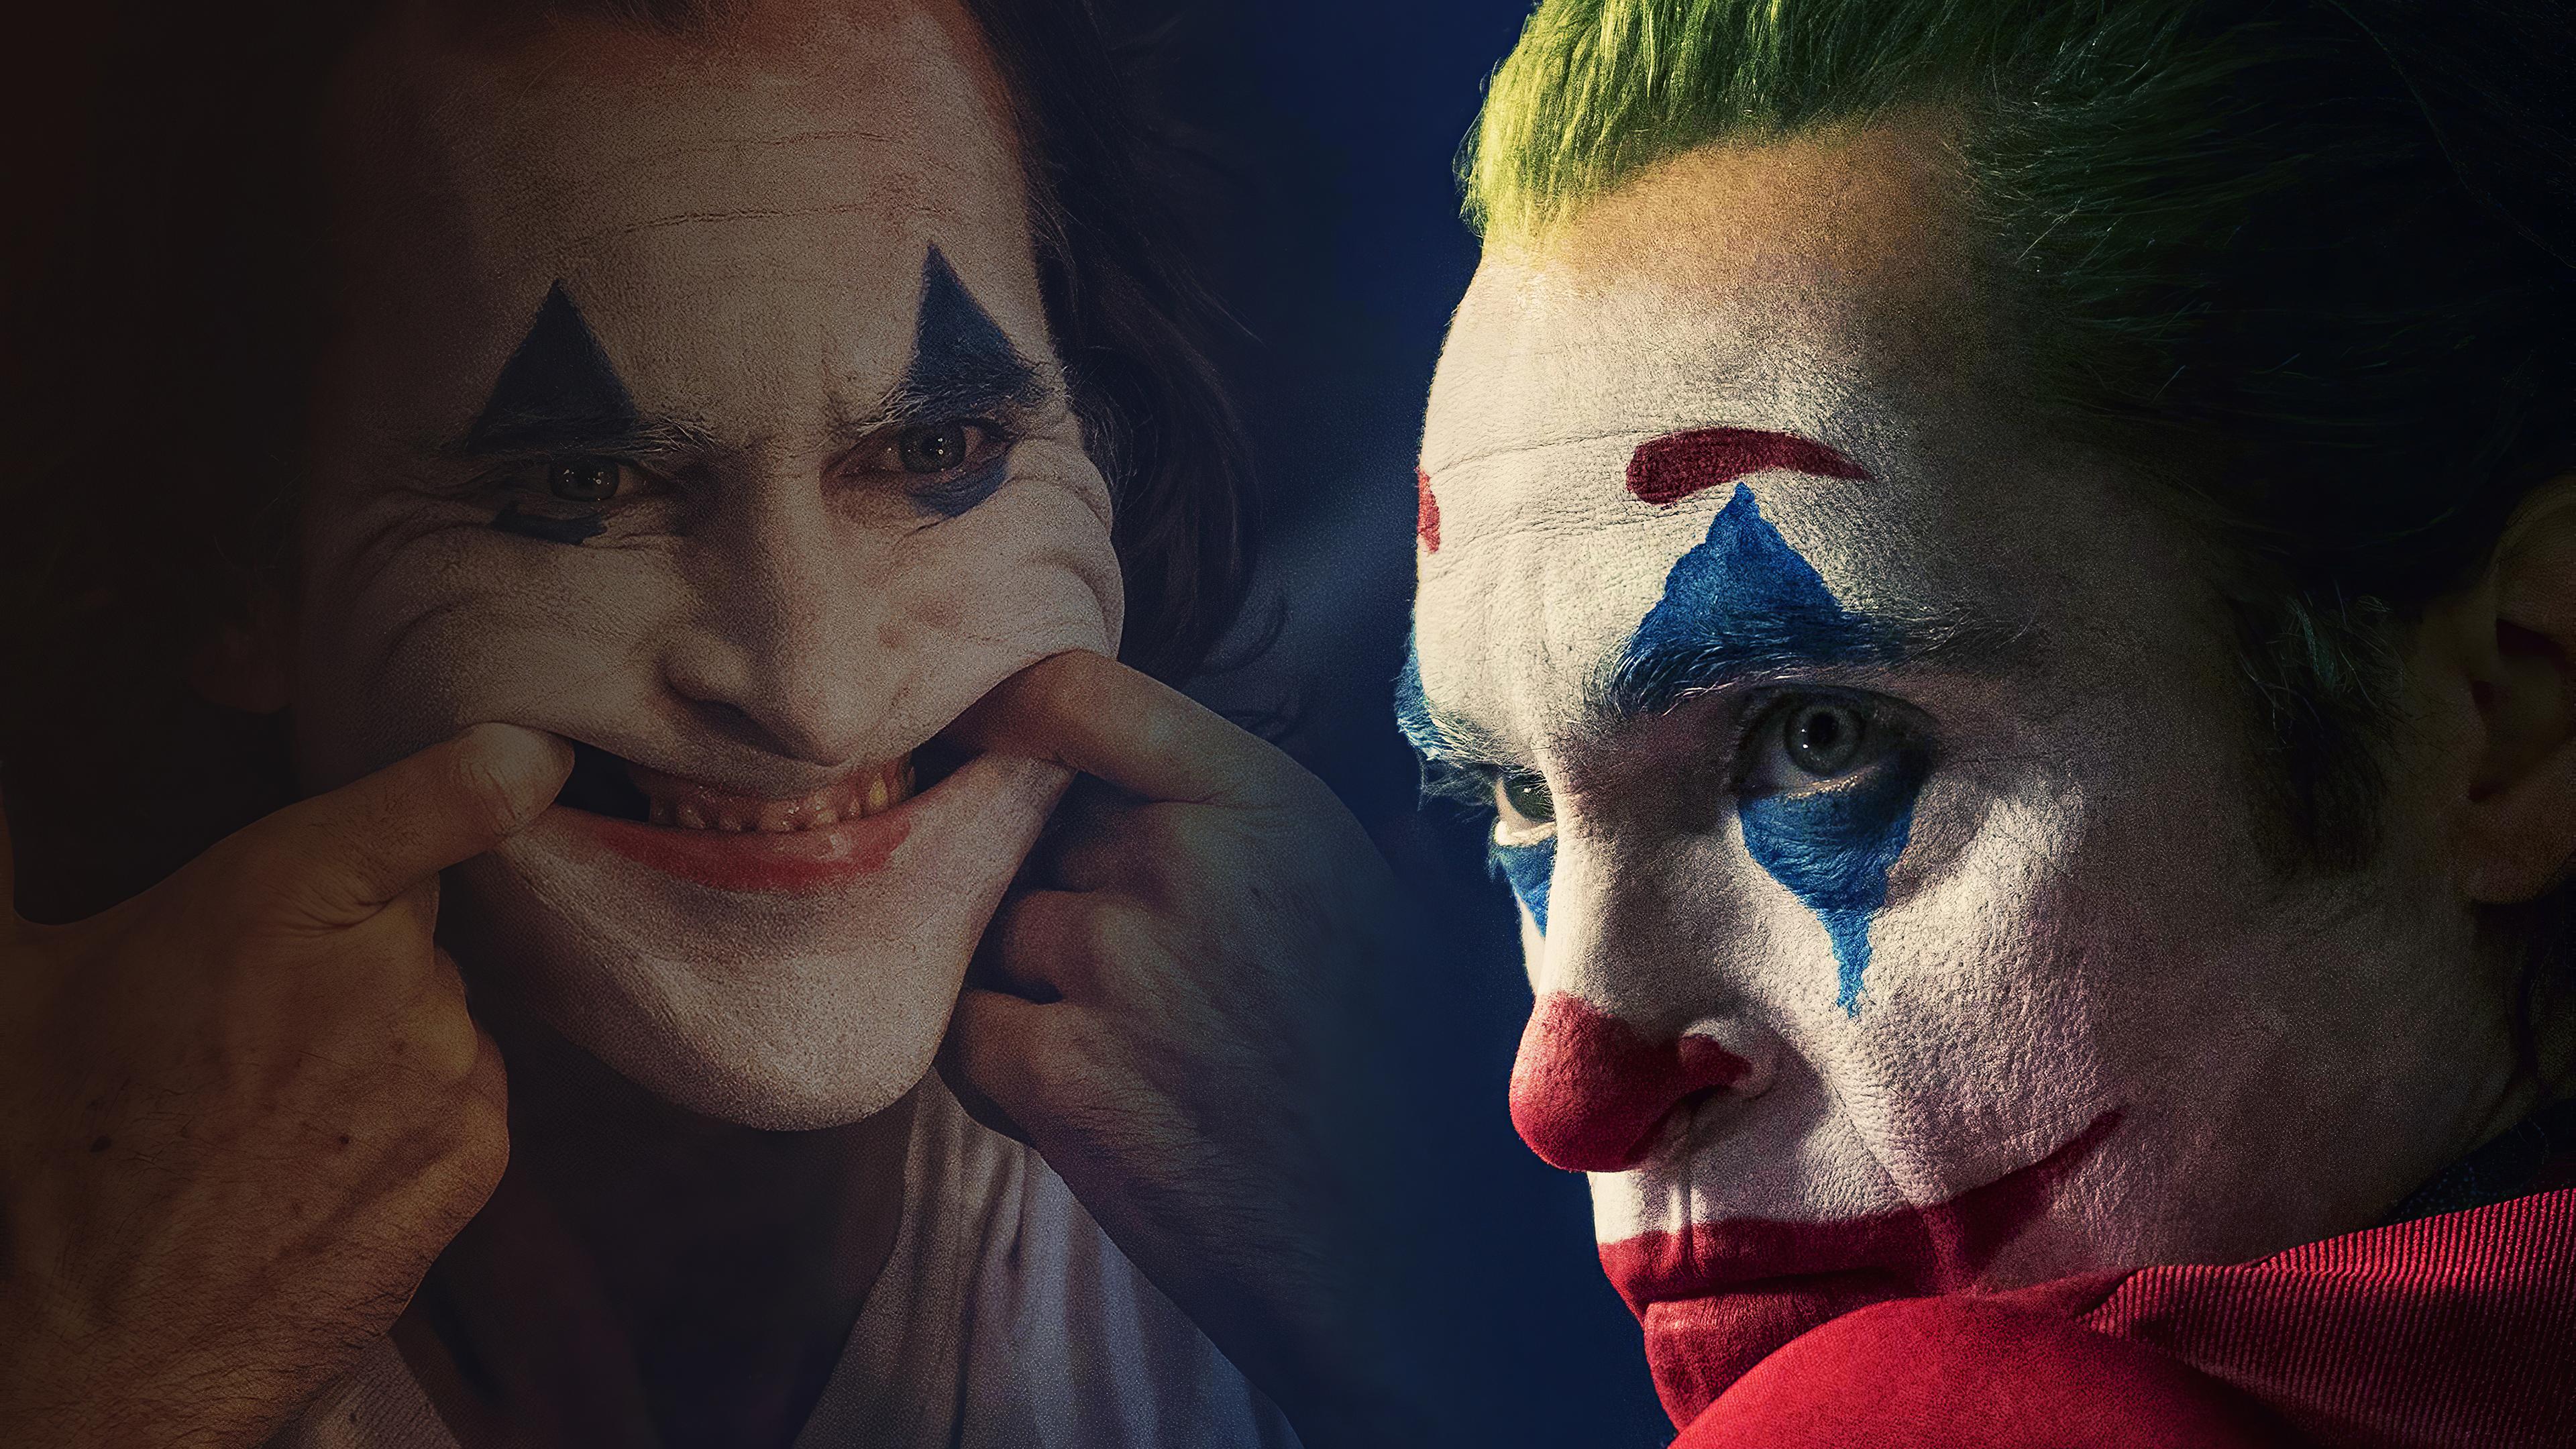 joker smile theraphy 1572368854 - Joker Smile Theraphy - supervillain wallpapers, superheroes wallpapers, joker wallpapers, hd-wallpapers, behance wallpapers, 4k-wallpapers